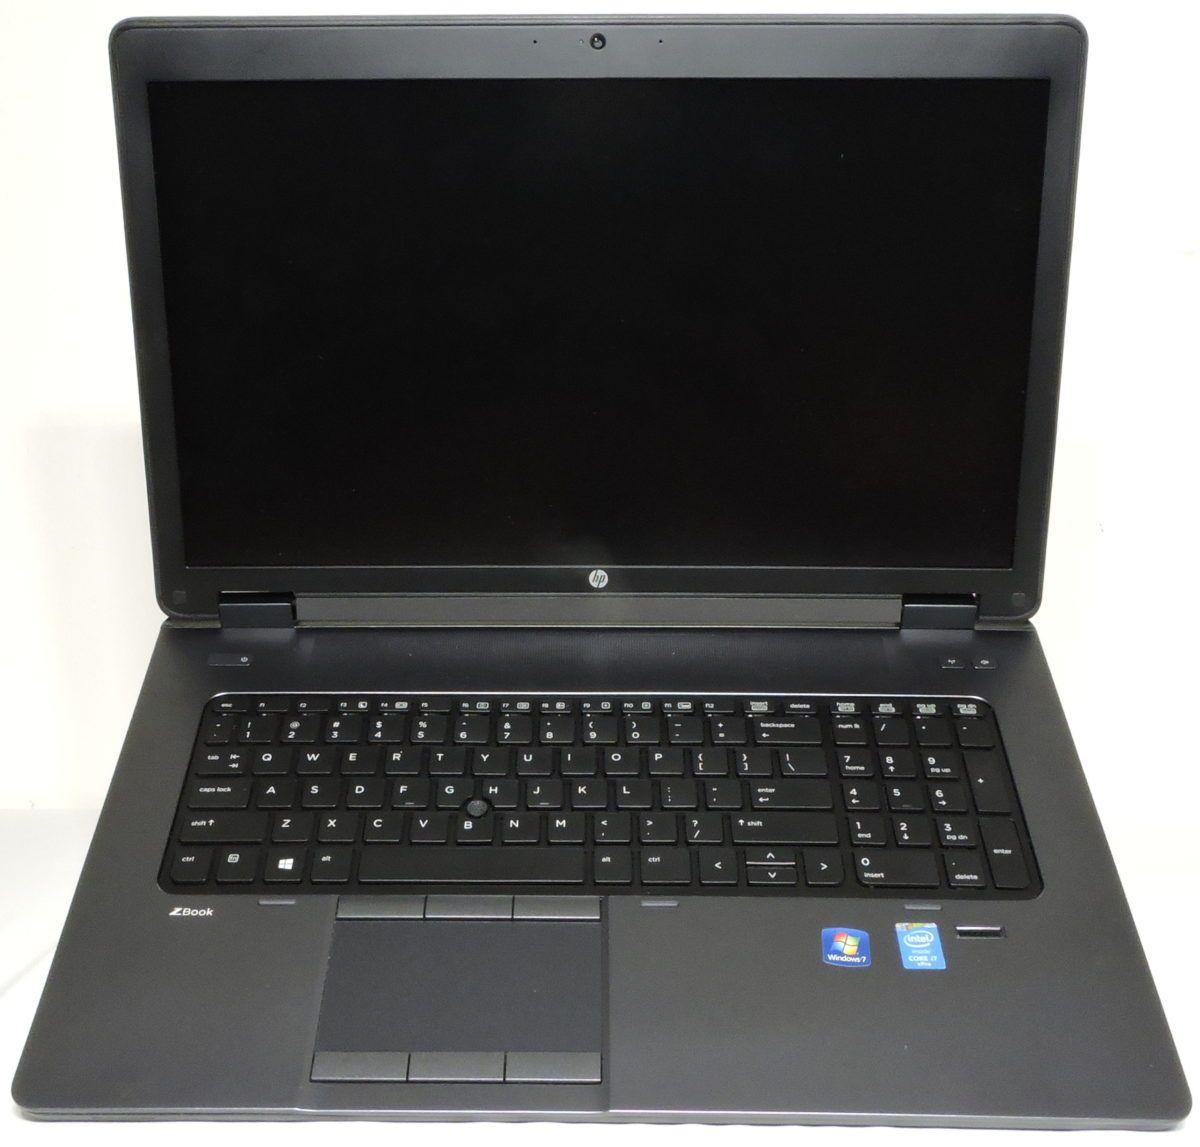 Hp Zbook 17 G2 Intel Core I7 4810mq Nvidia Quadro K3100m 16gb